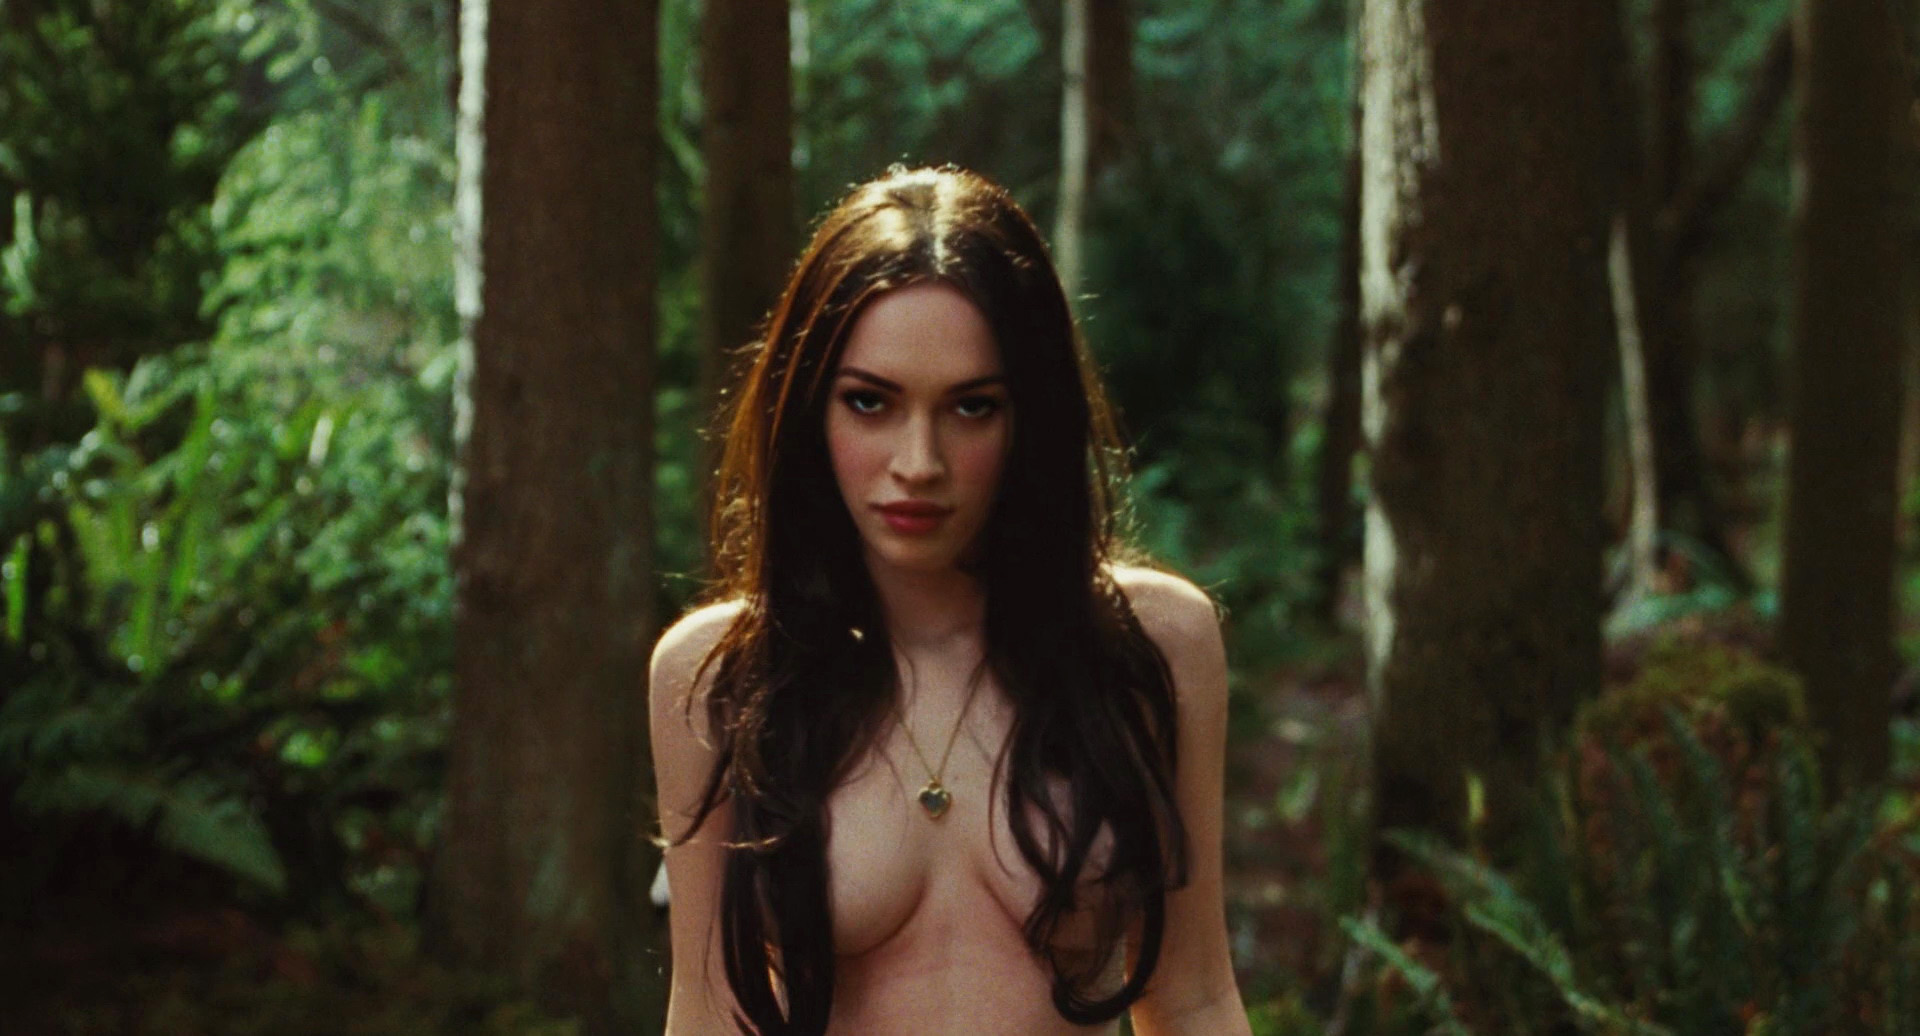 Amanda Sex Movie watch online - megan fox, amanda seyfried – jennifer's body